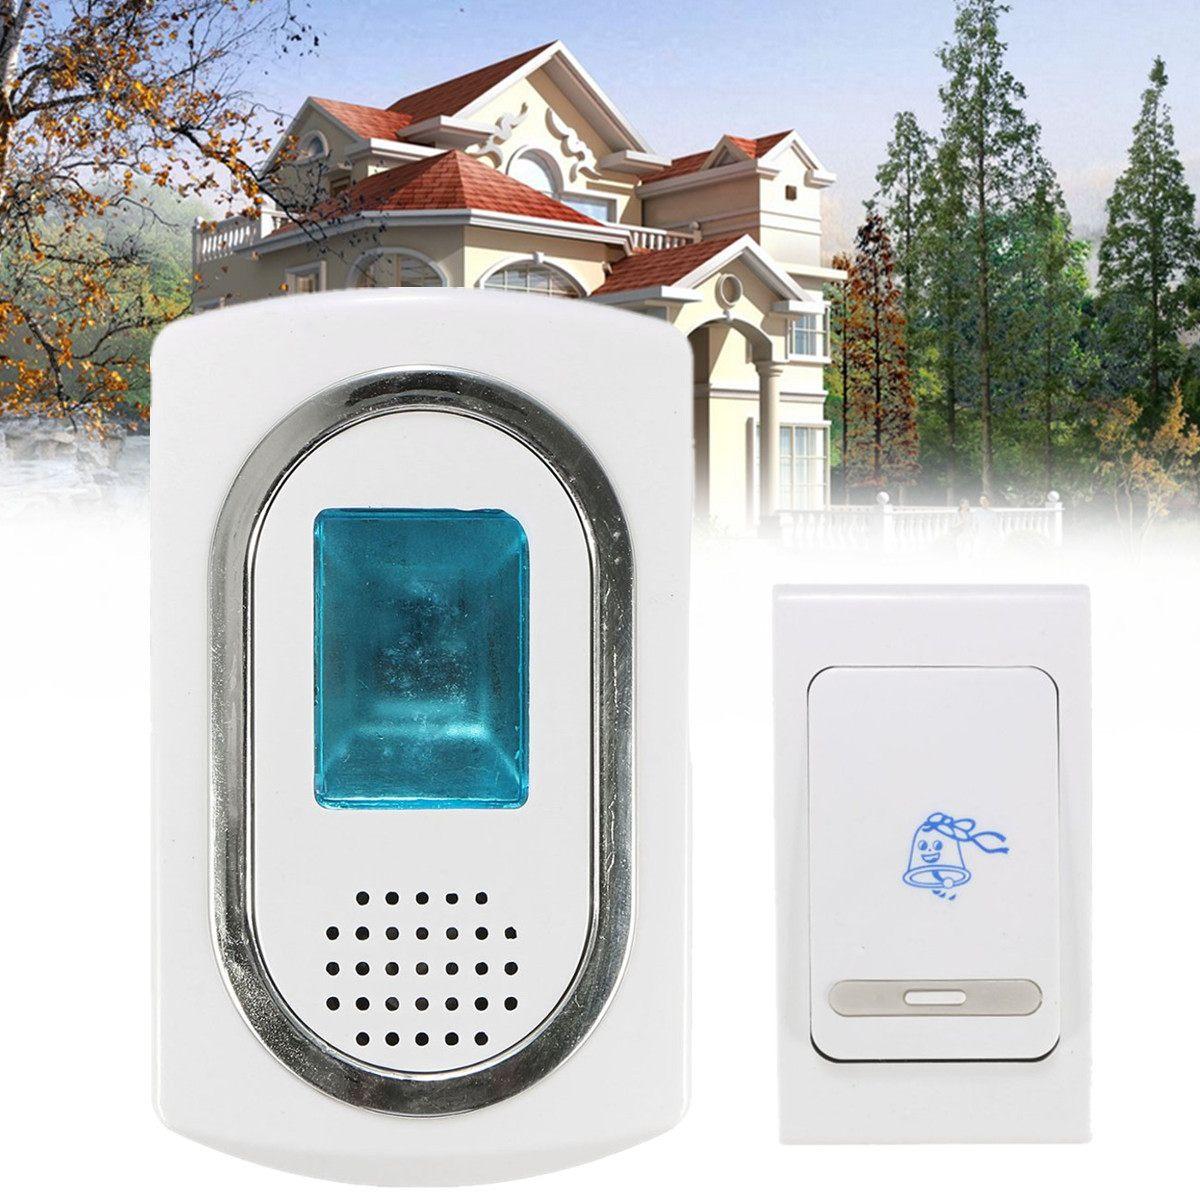 Wireless Digital Cordless Doorbell Home Wall Plug-in 36 Music Chimes Door  Bell 100M Range  9V 15W Door Ring Alarm Bell